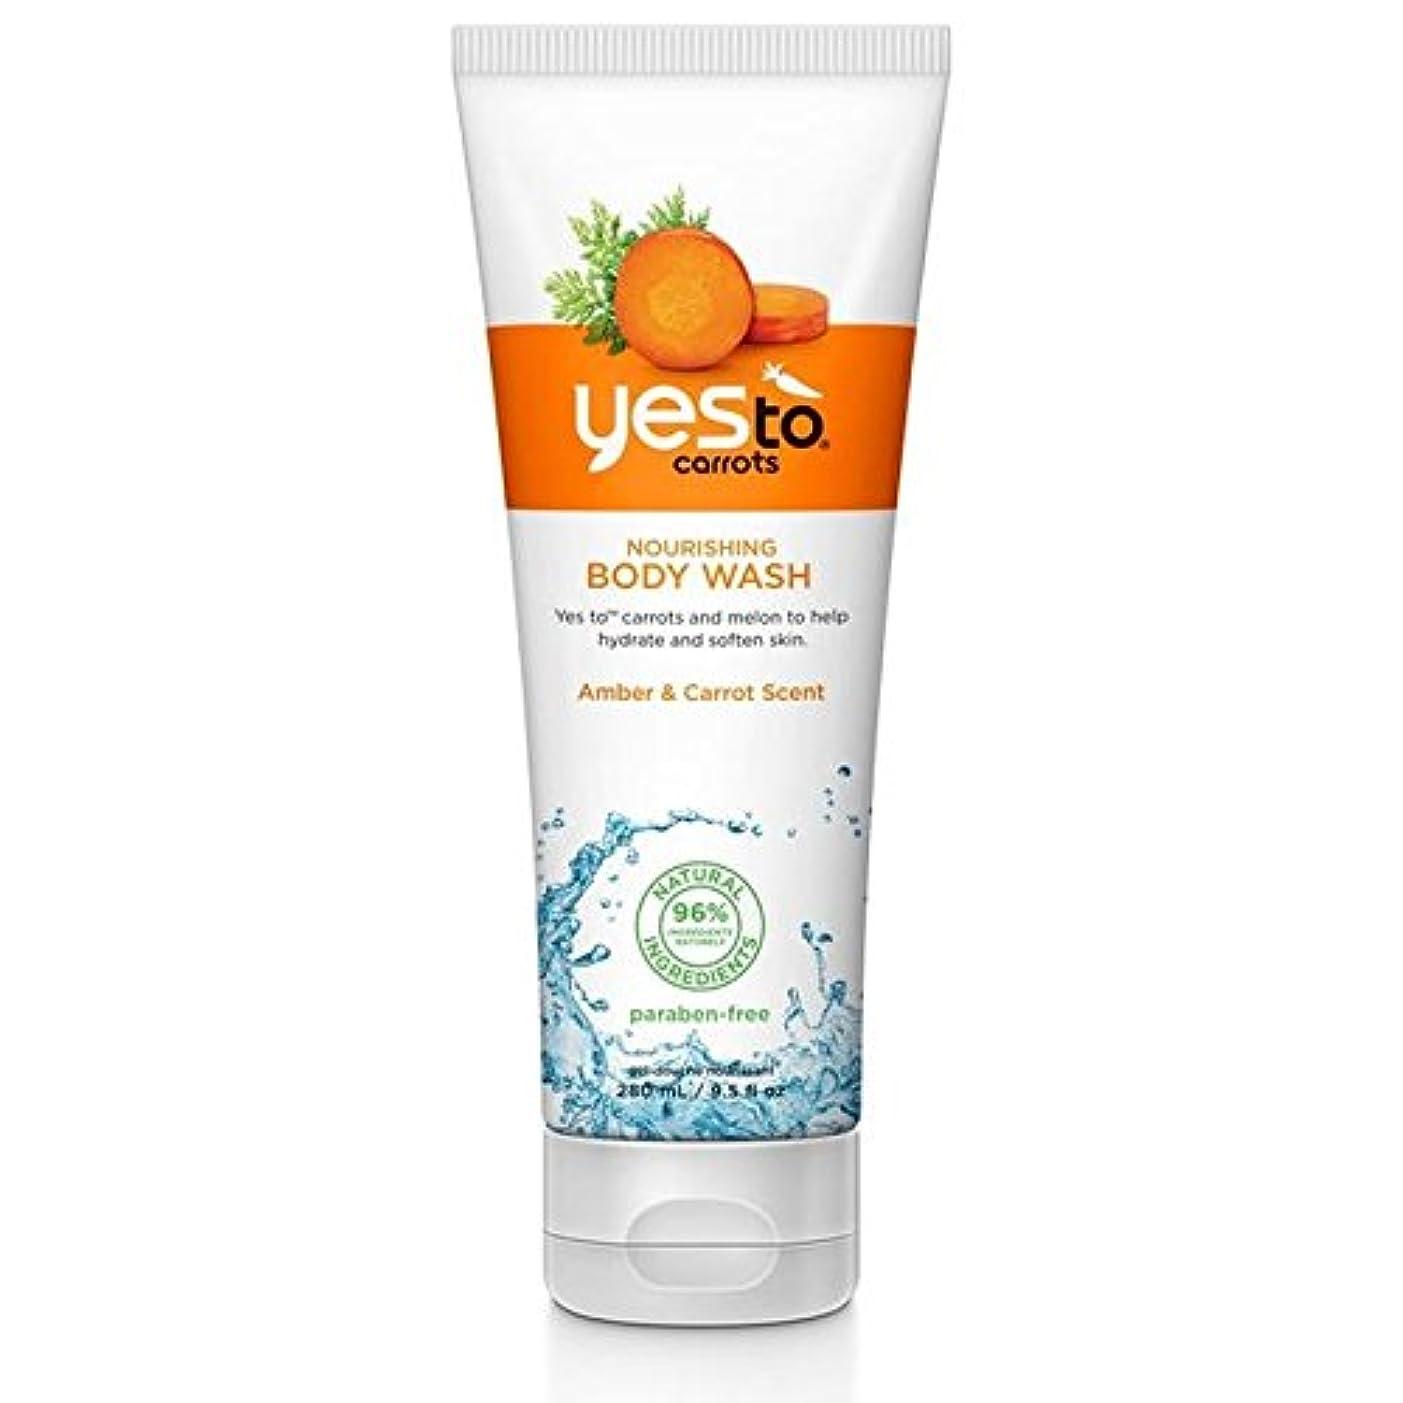 Yes To Carrots Nourishing Body Wash 280ml - はいボディウォッシュ280ミリリットル栄養ニンジンへ [並行輸入品]